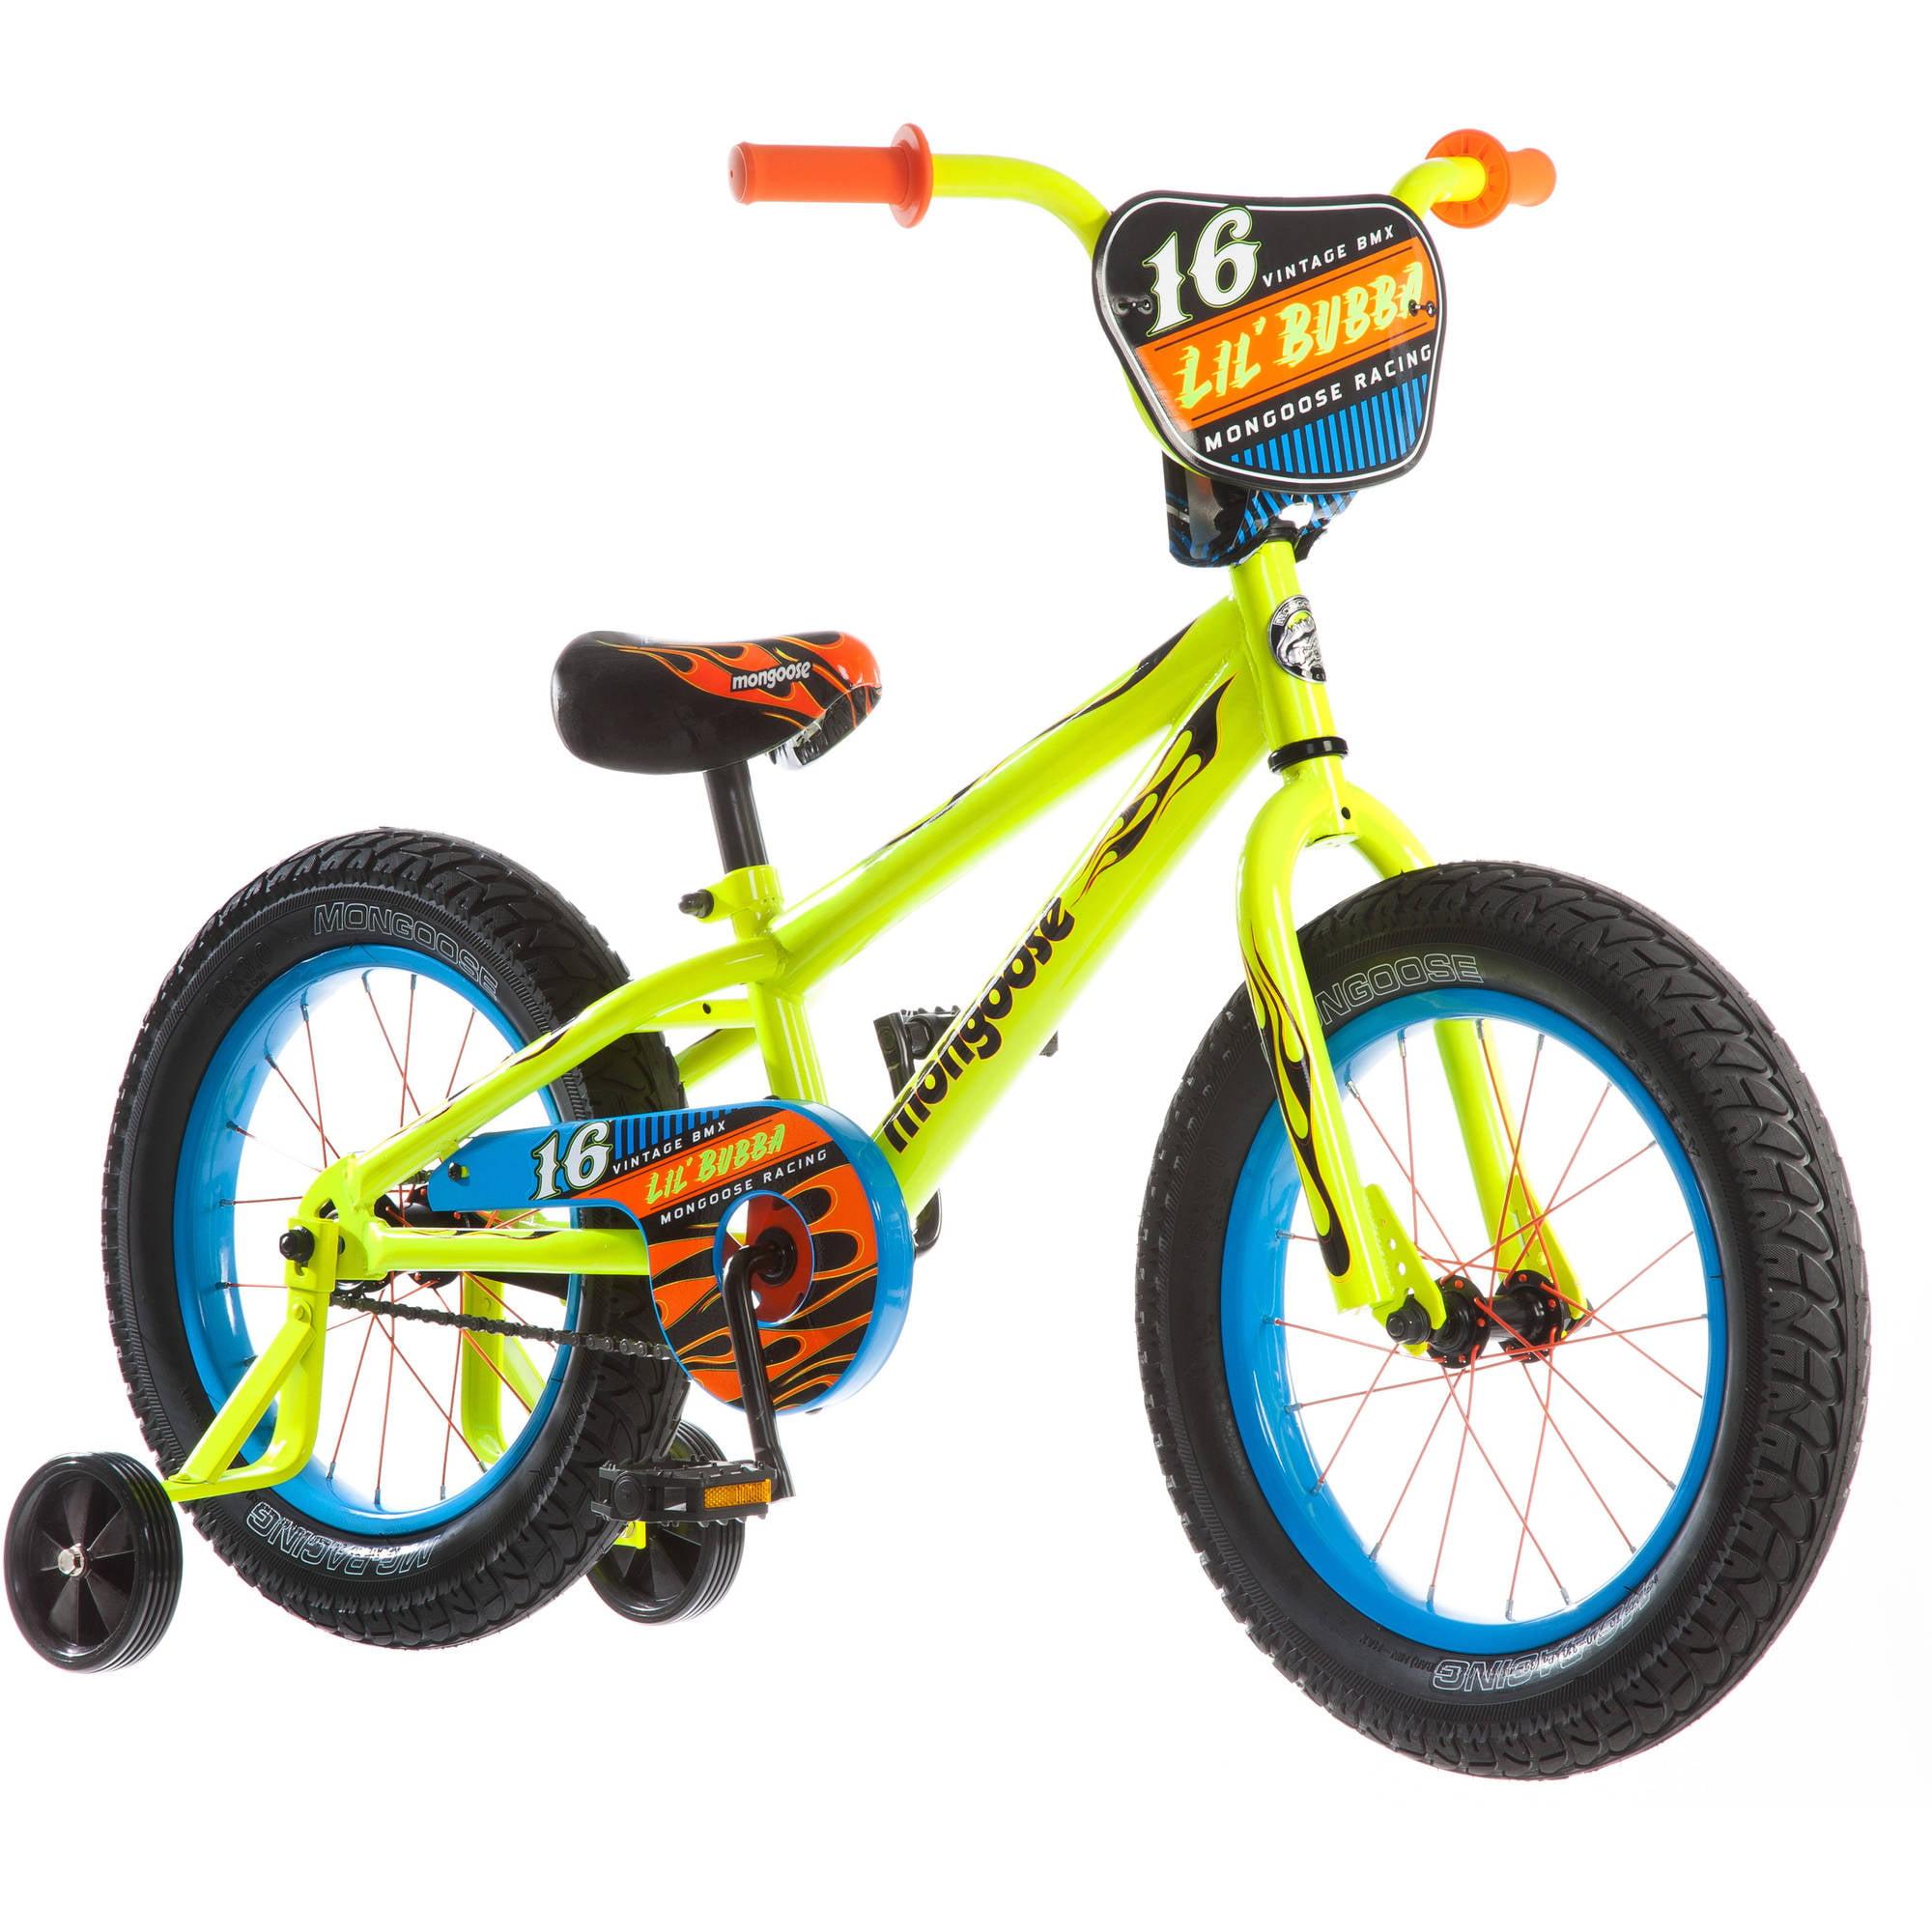 "16"" Mongoose Lil Bubba Boys' Fat Tire Bike, Neon Yellow"